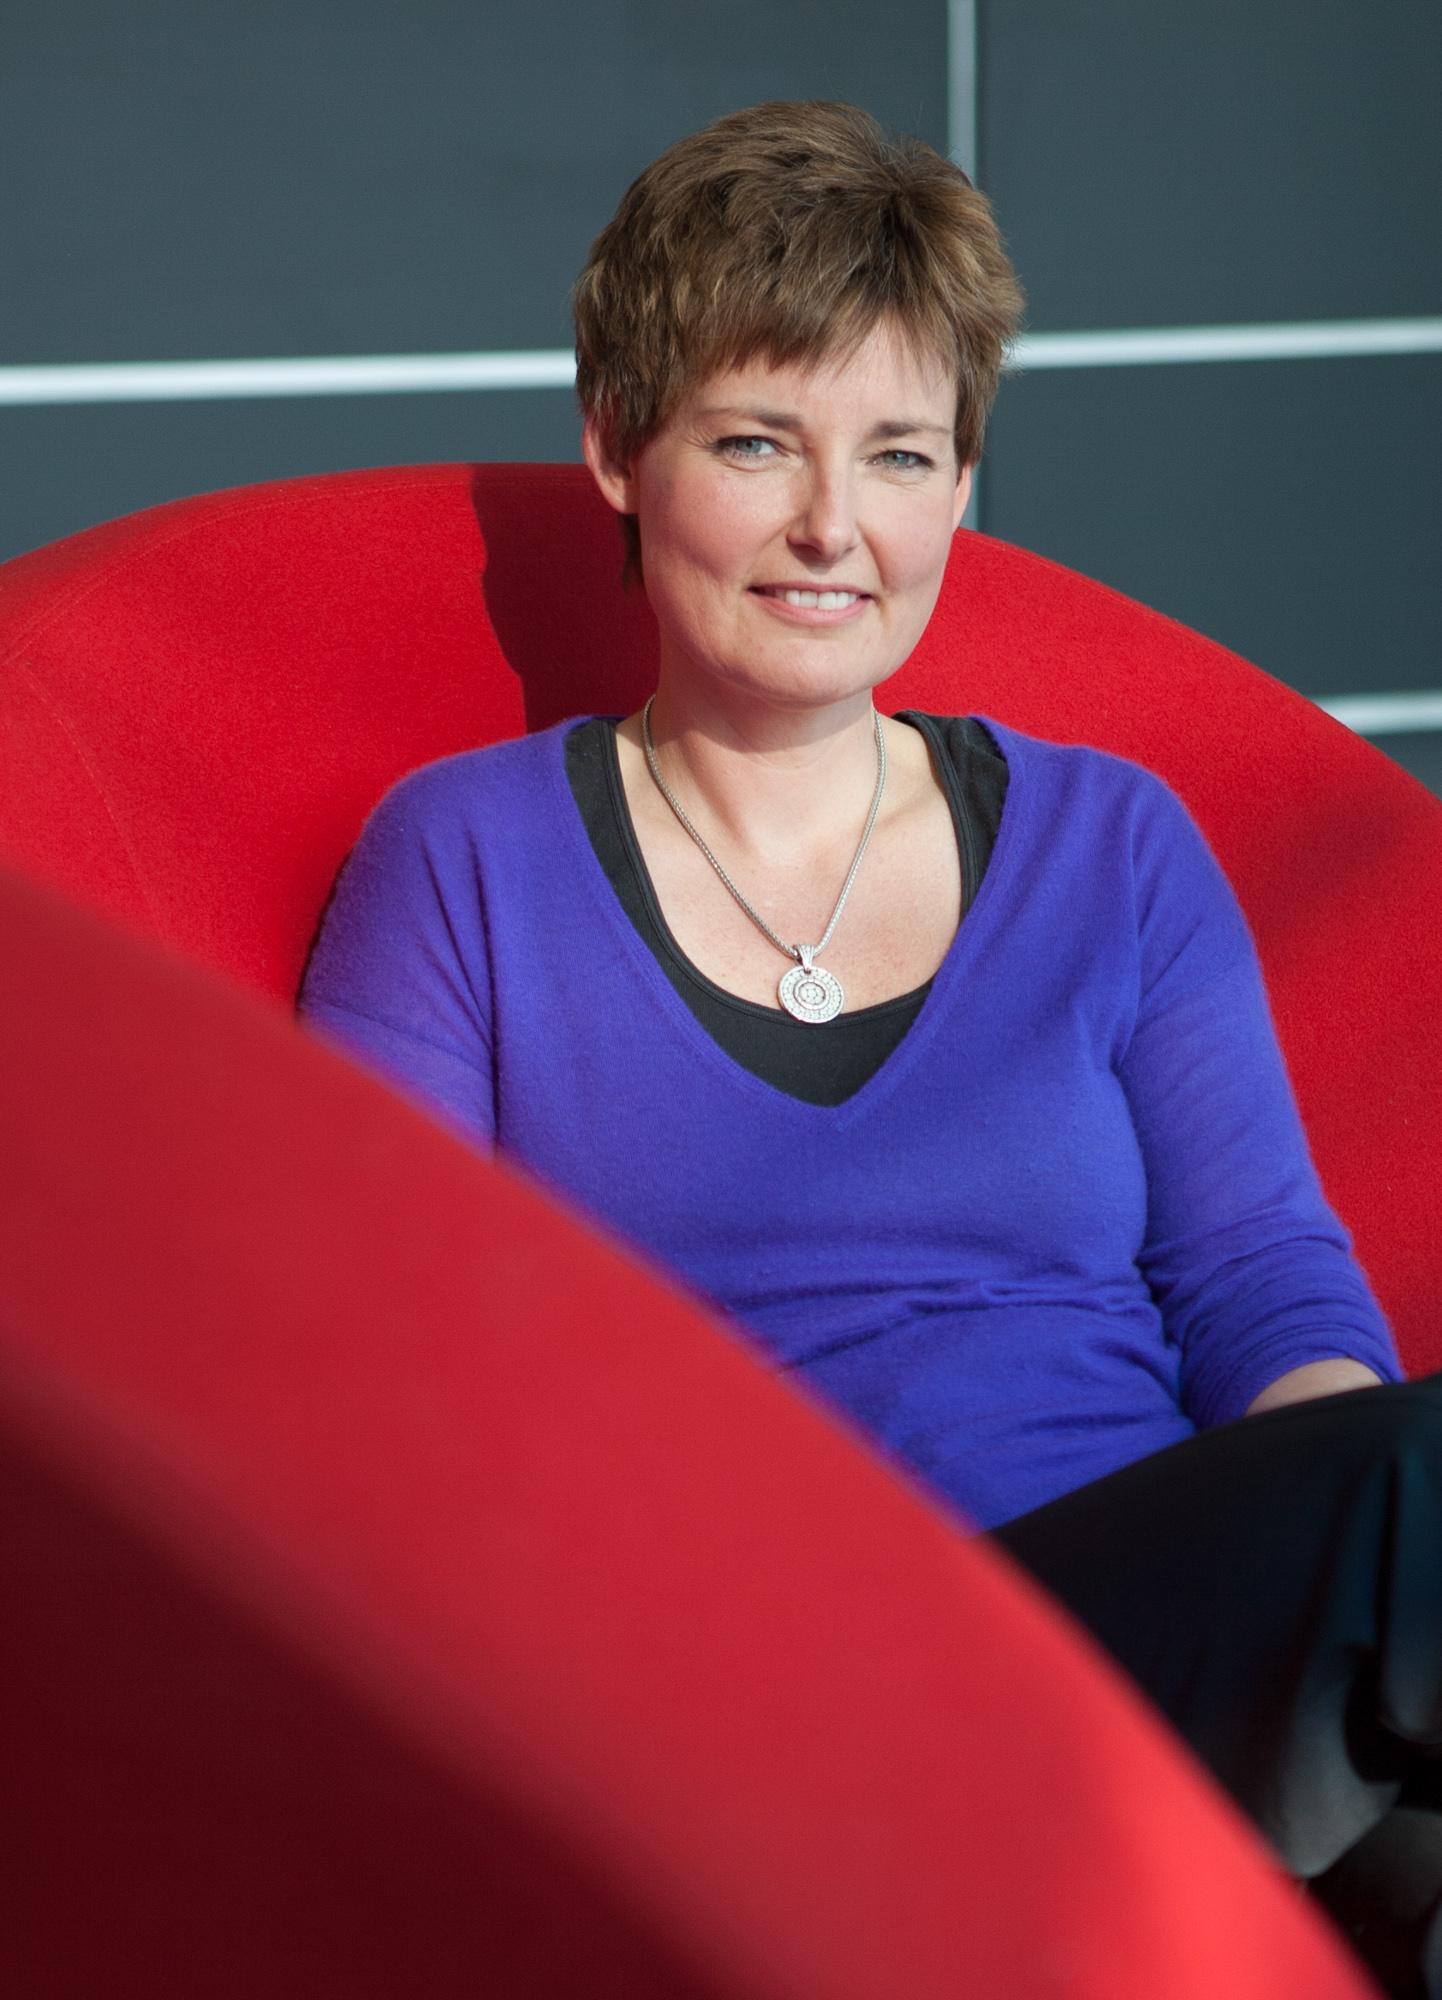 Samantha Pearce, Celgene